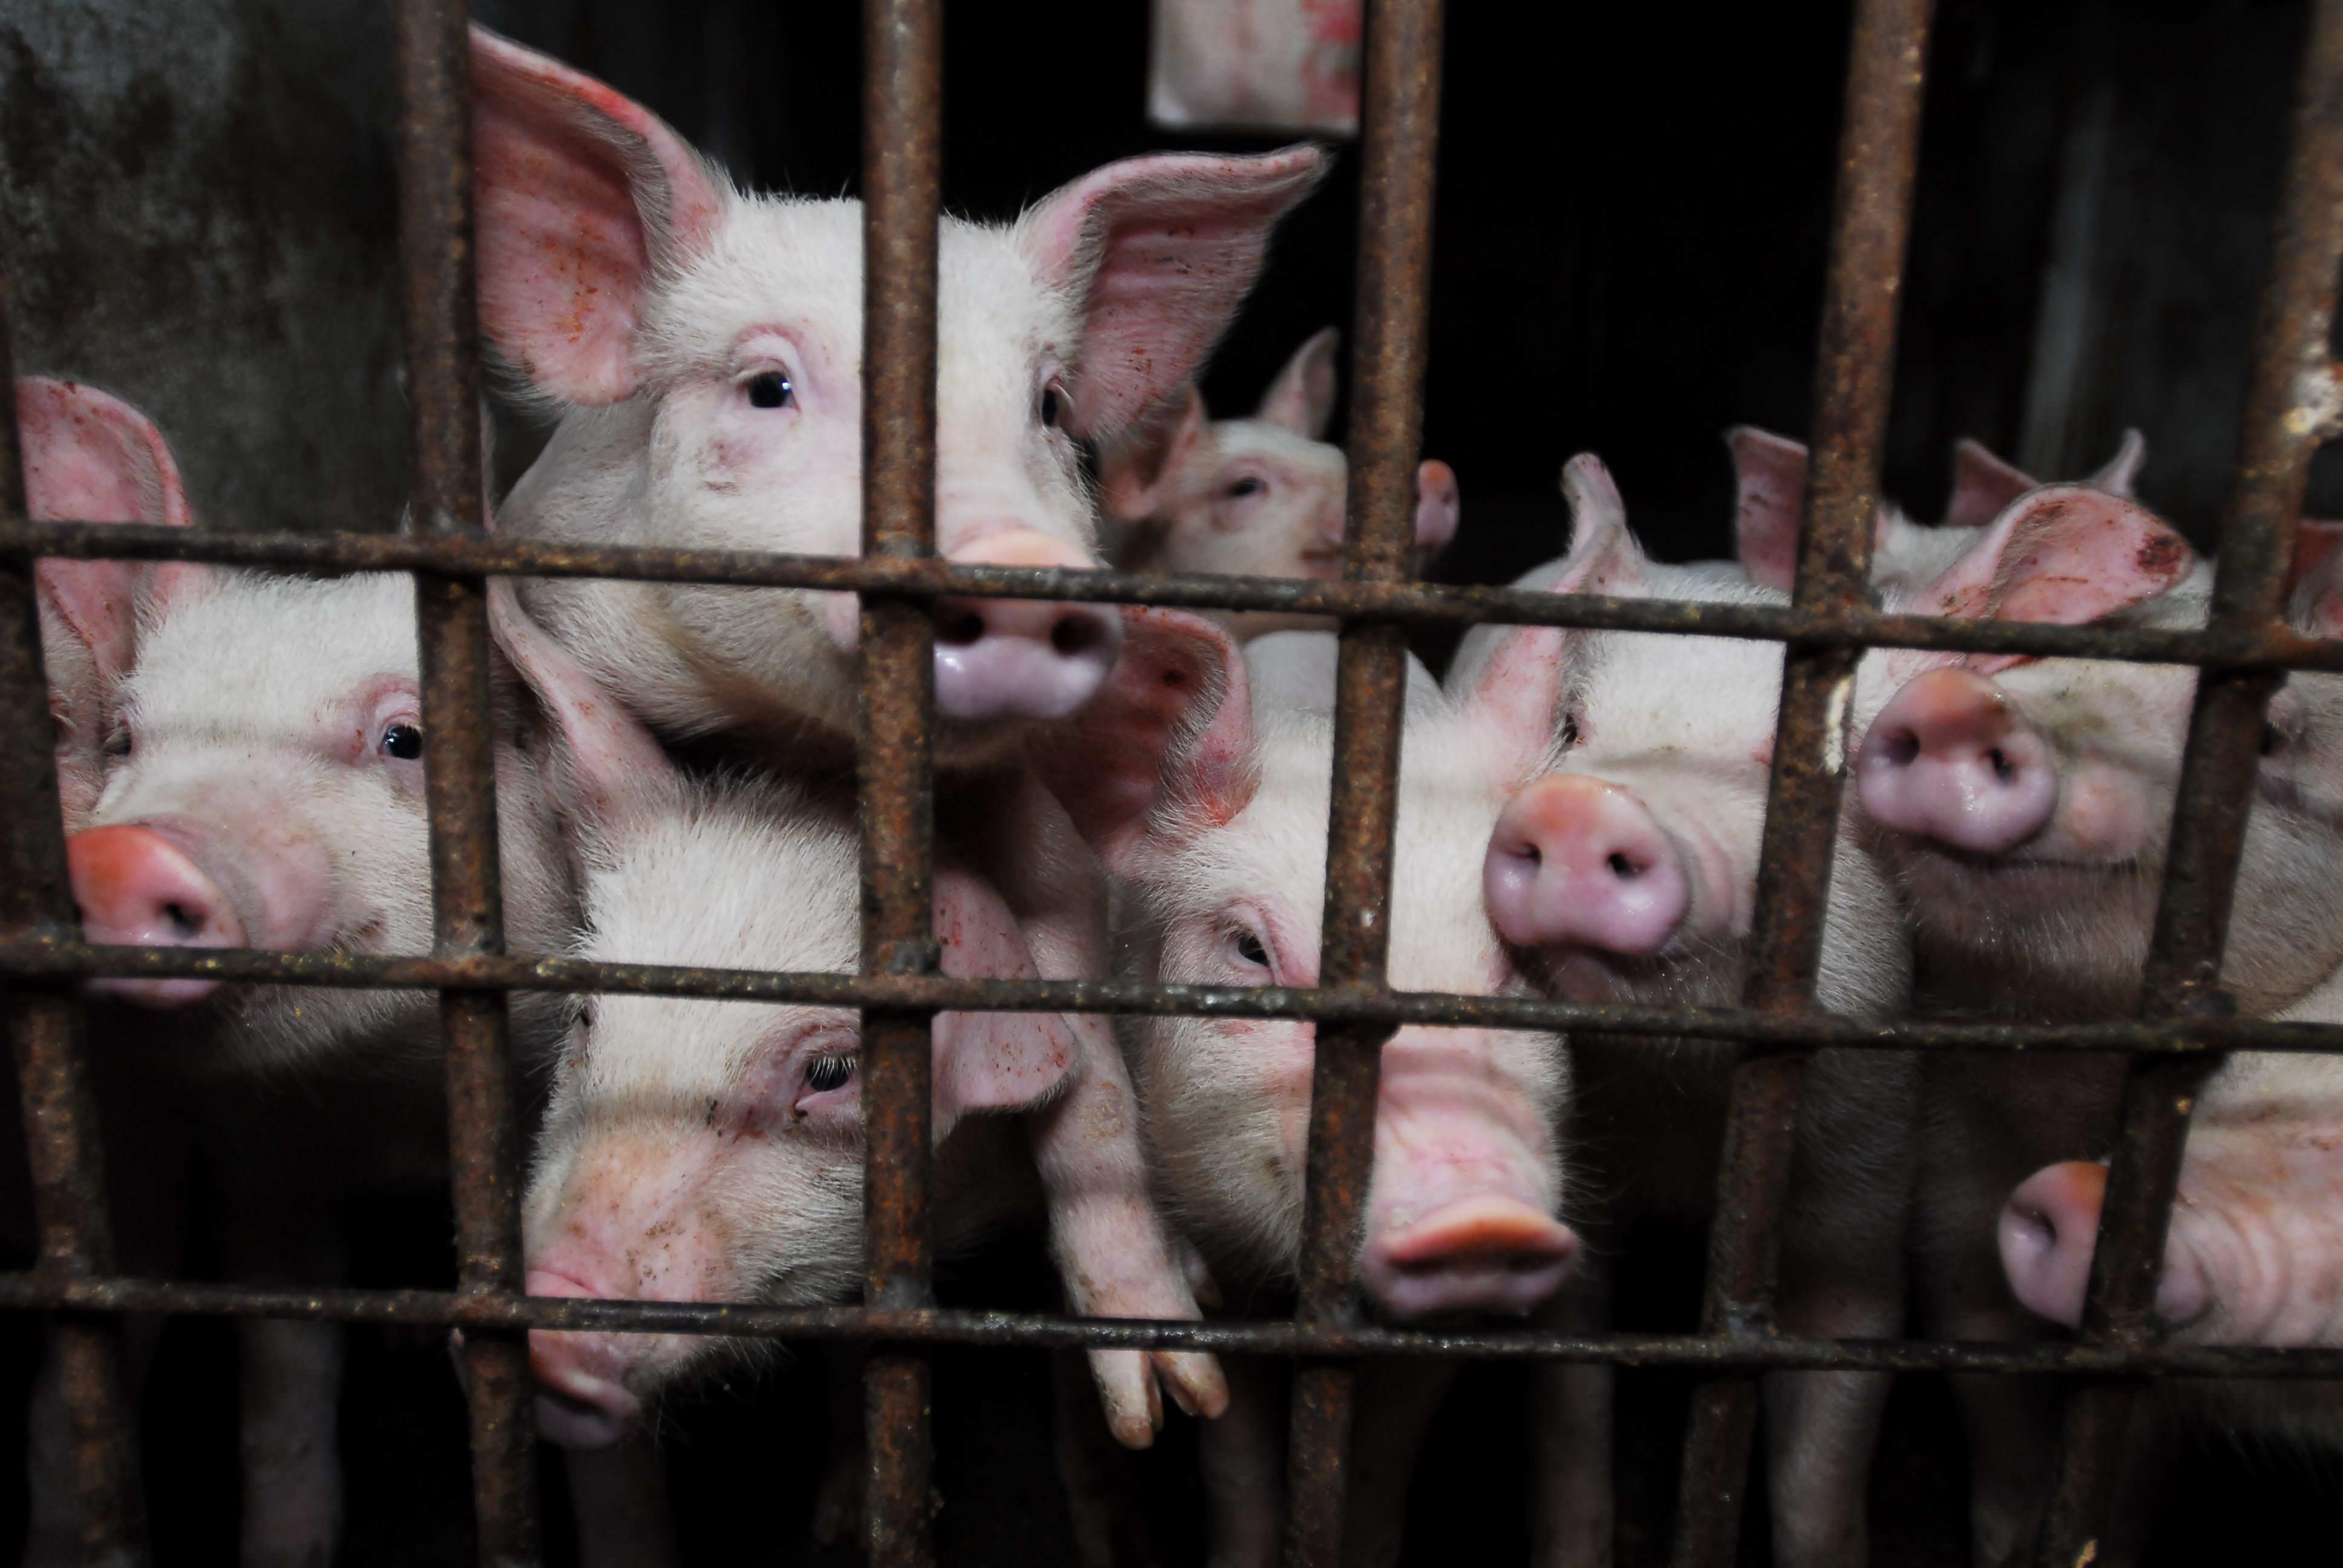 factory farming animal cruelty